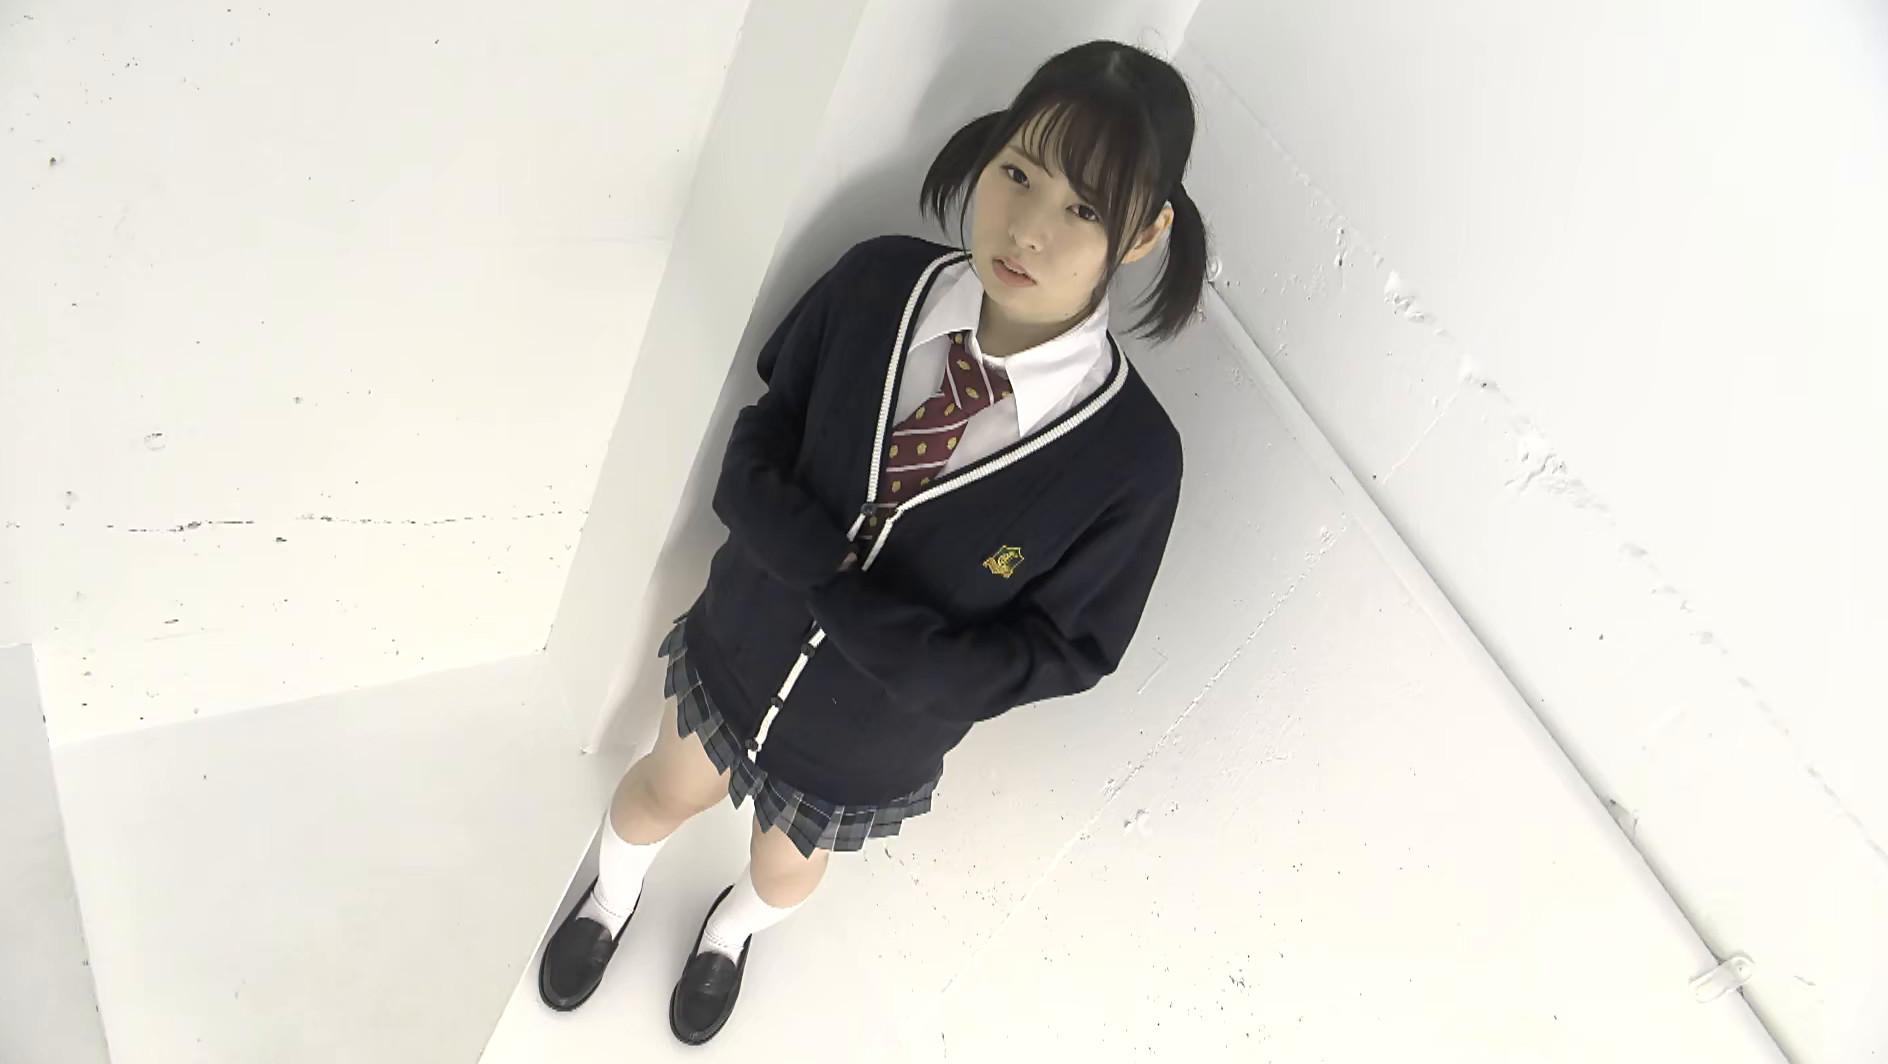 Conscience~葛藤~ 石森みずほ 画像4